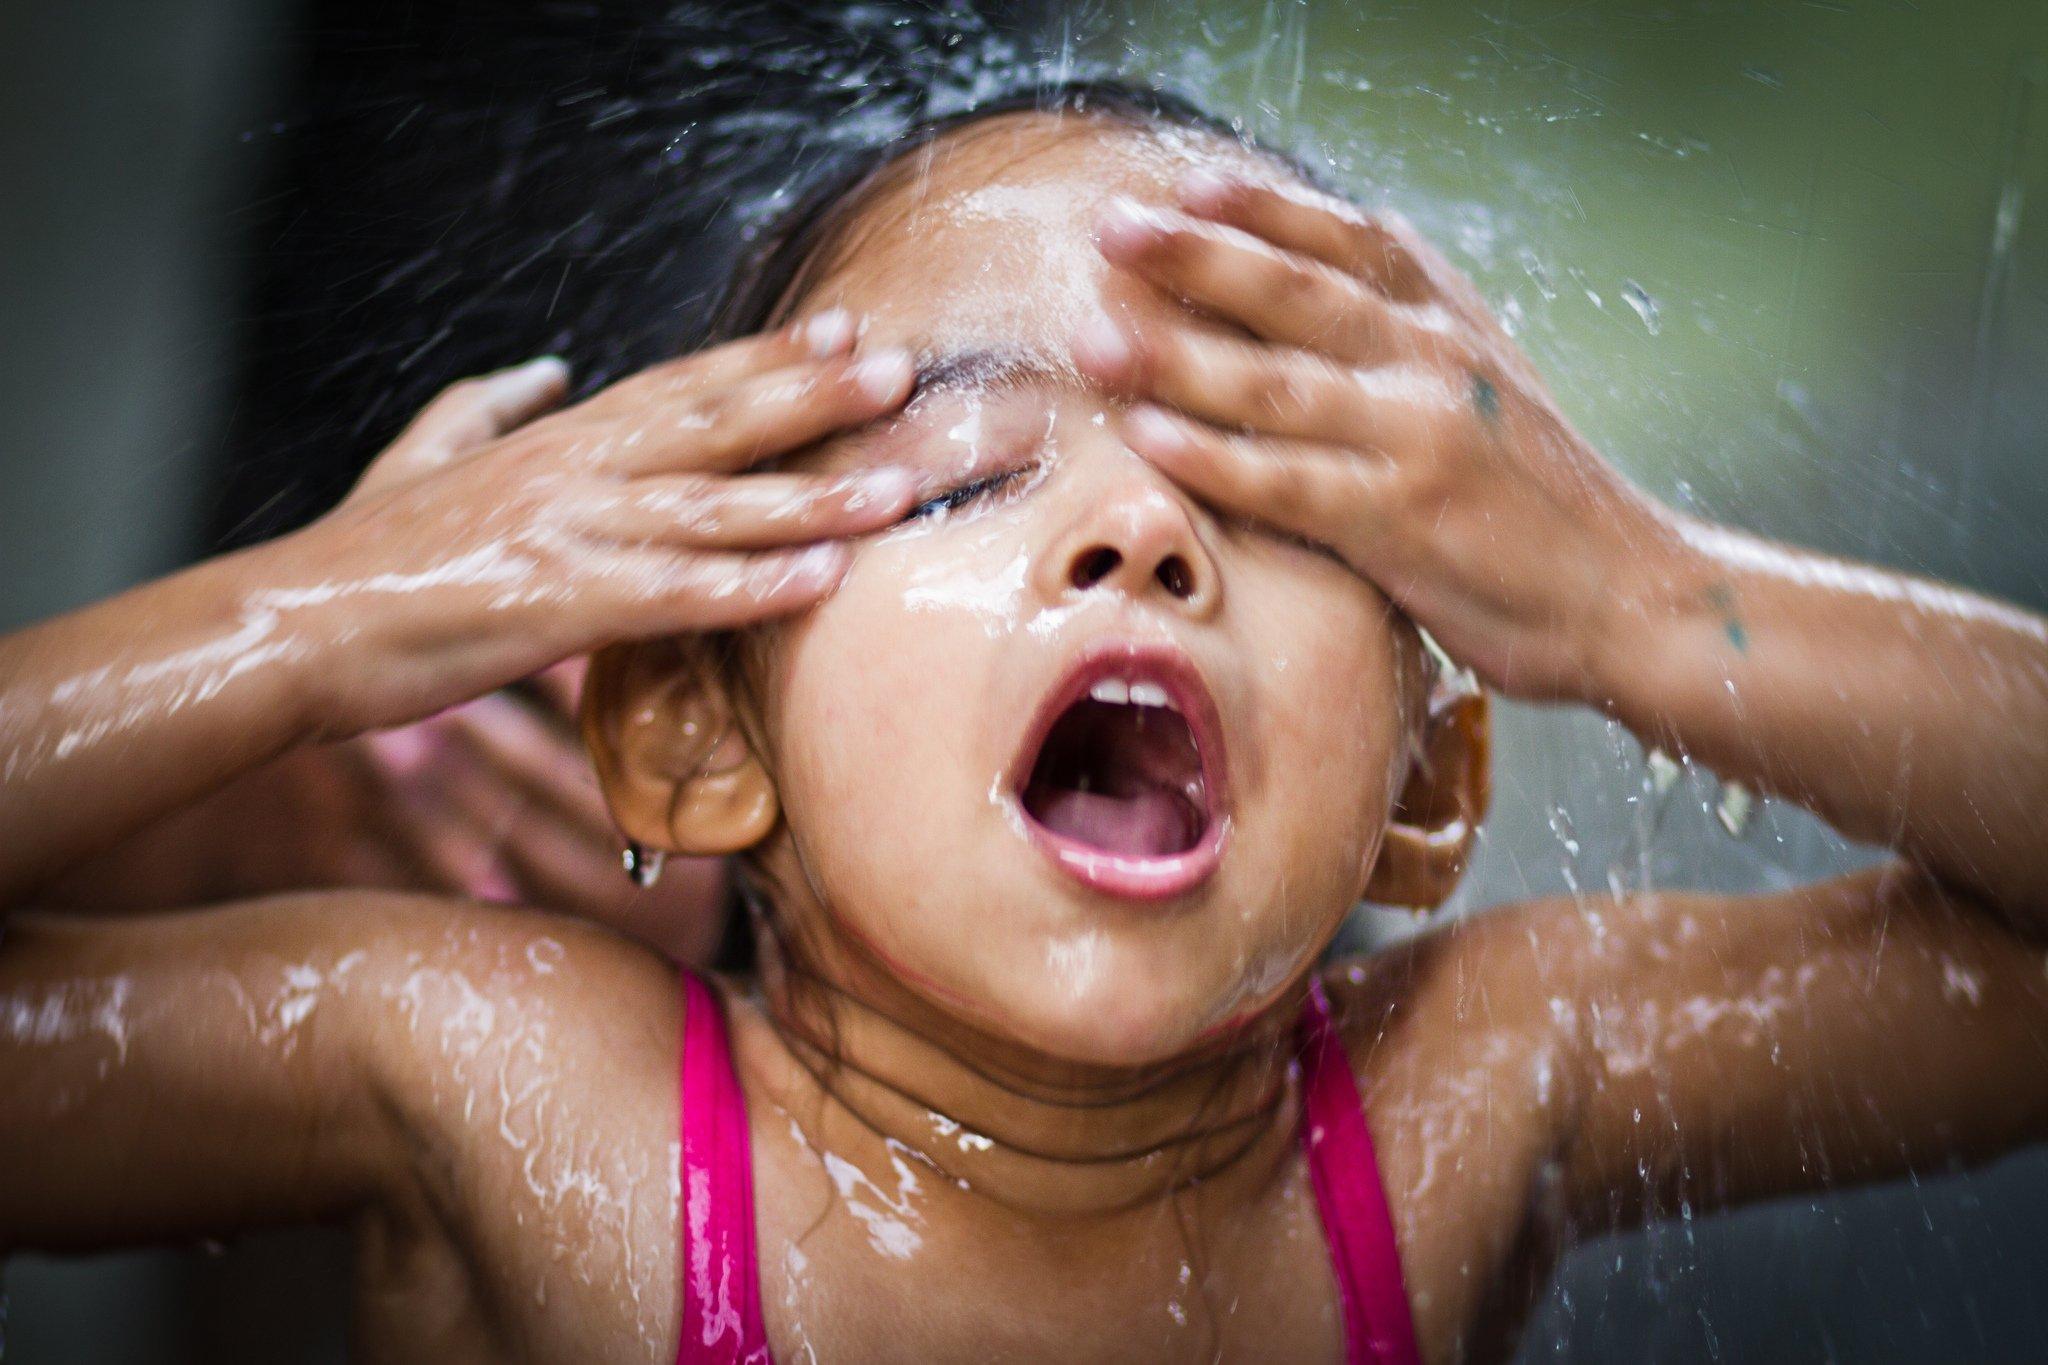 Banho na Viela. Janeiro de 2014, Jardim Ibirapuera, Zona Sul/SP. Foto: Joseh Sillva